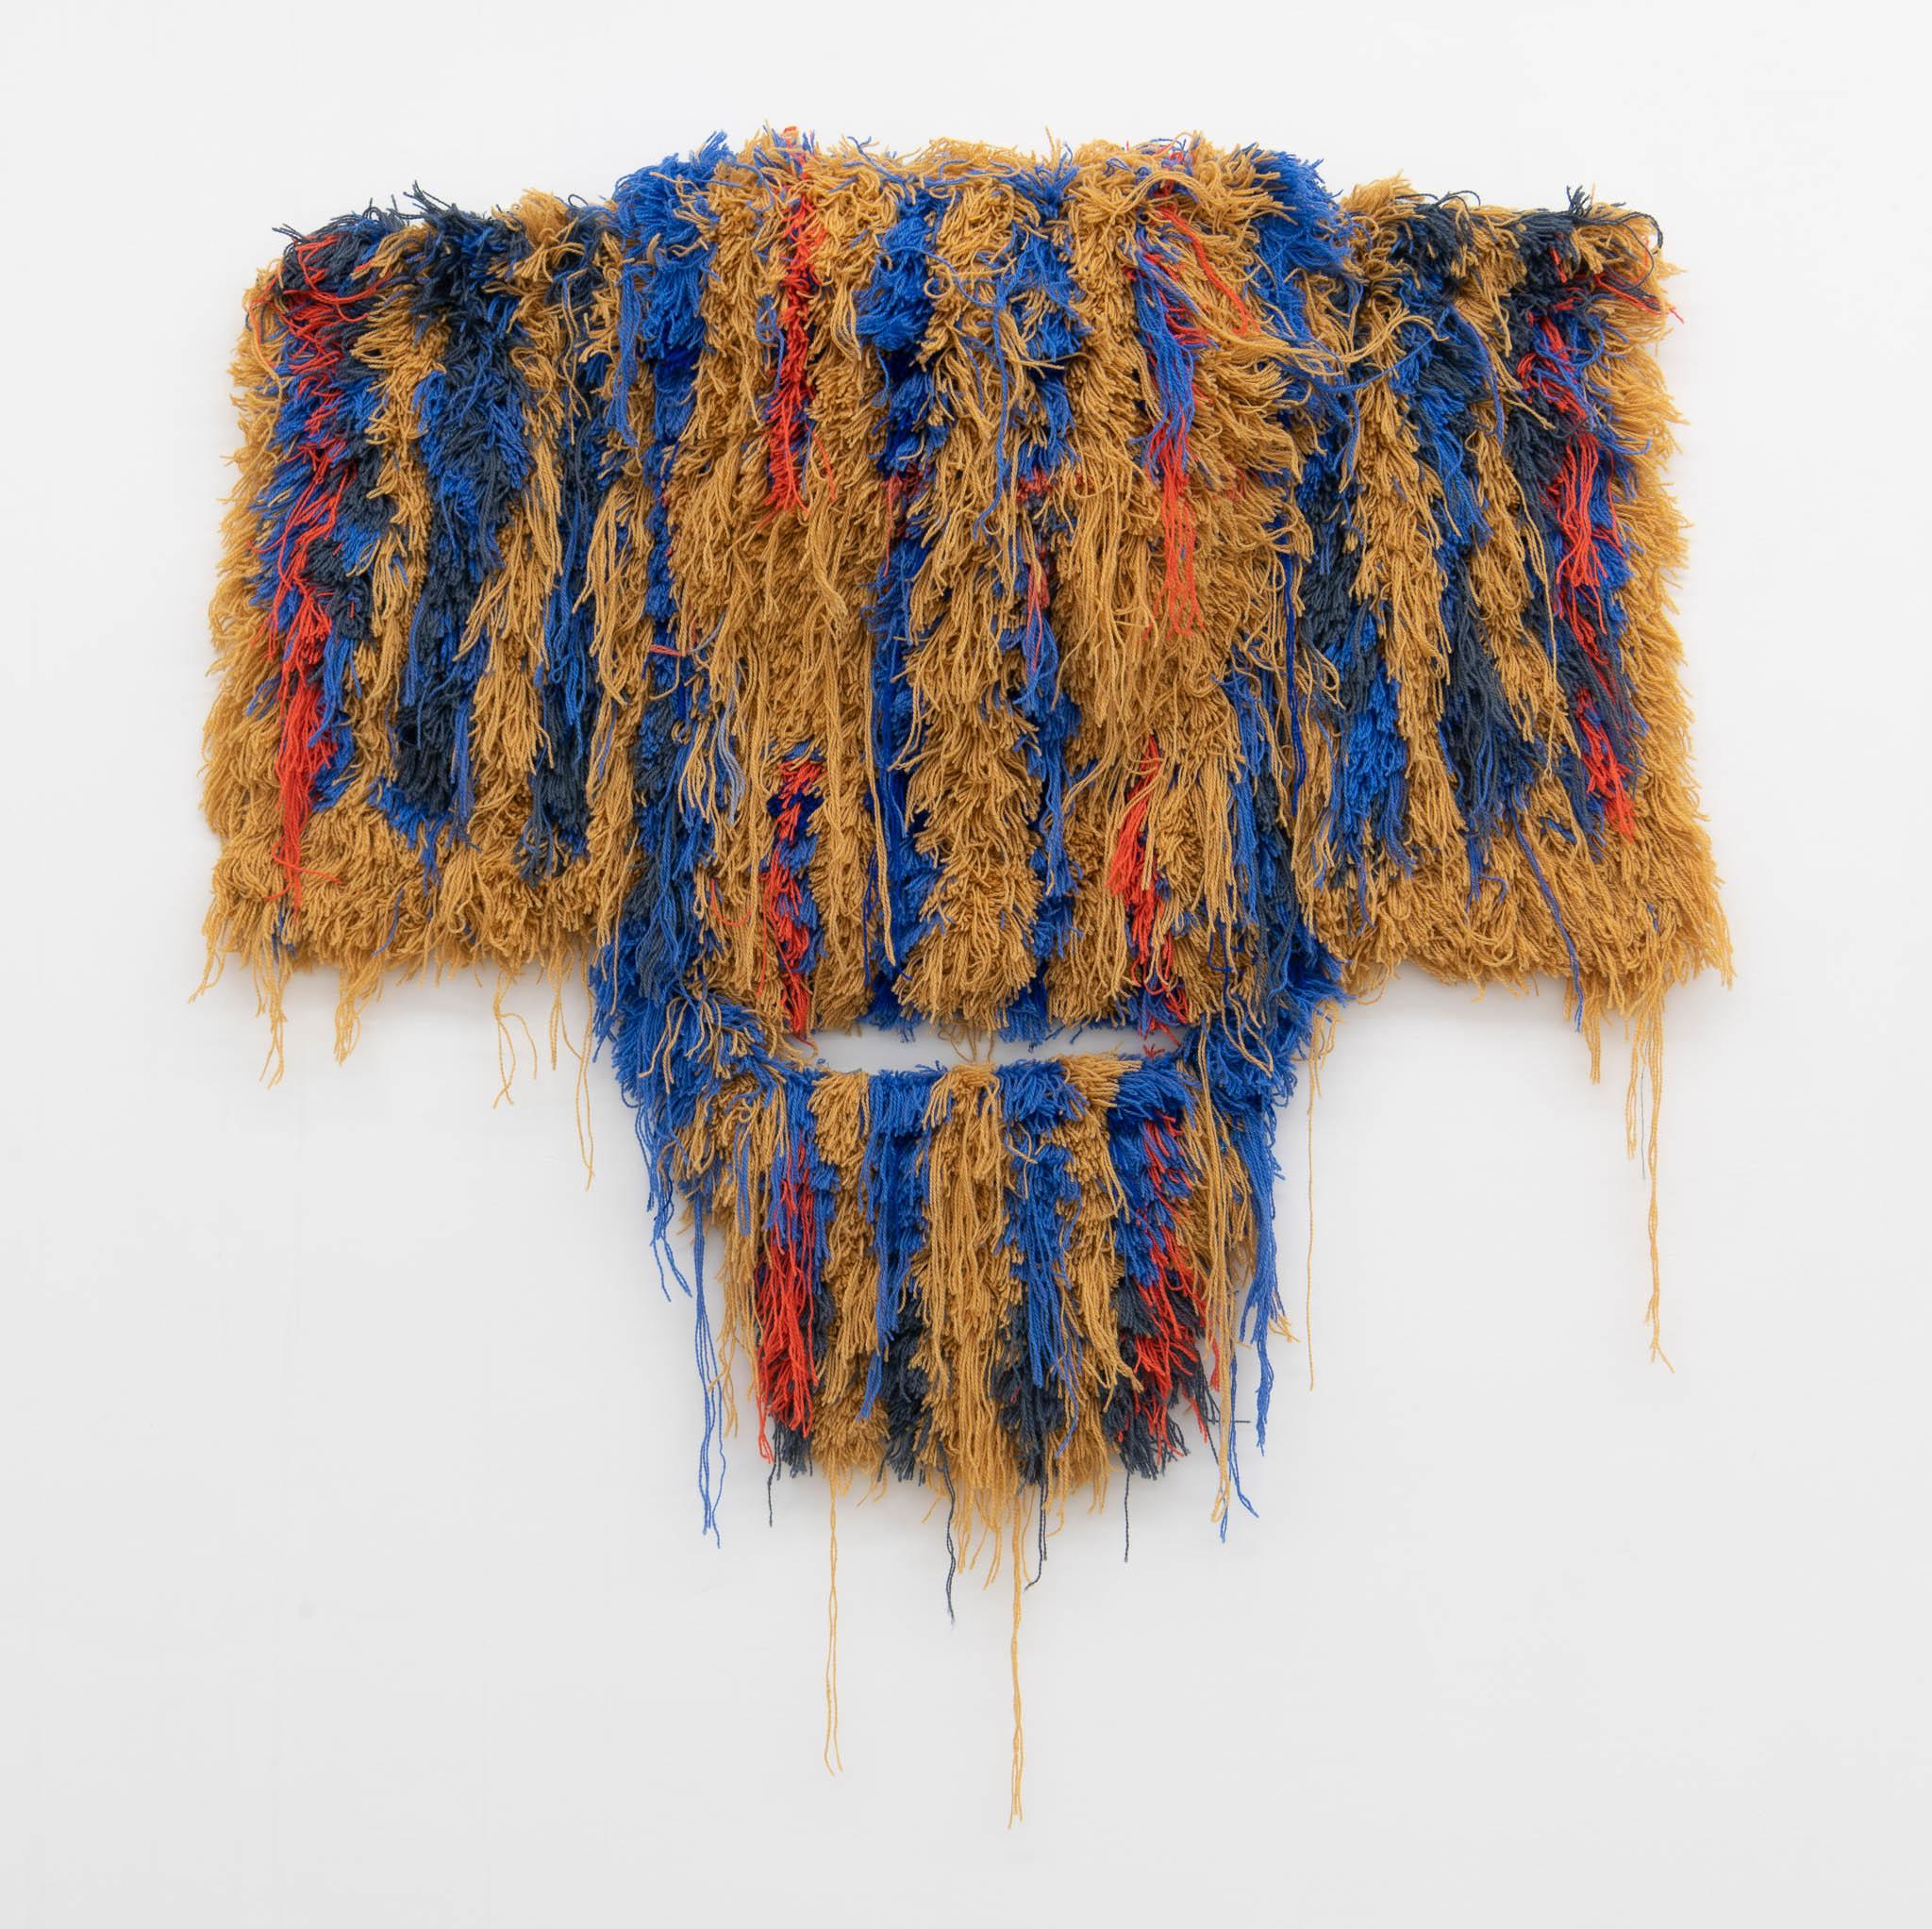 . Caroline Achaintre Herbert, 2018, lana tastata a mano; Courtesy Galerie Art : Concept; foto Giorgio Benni